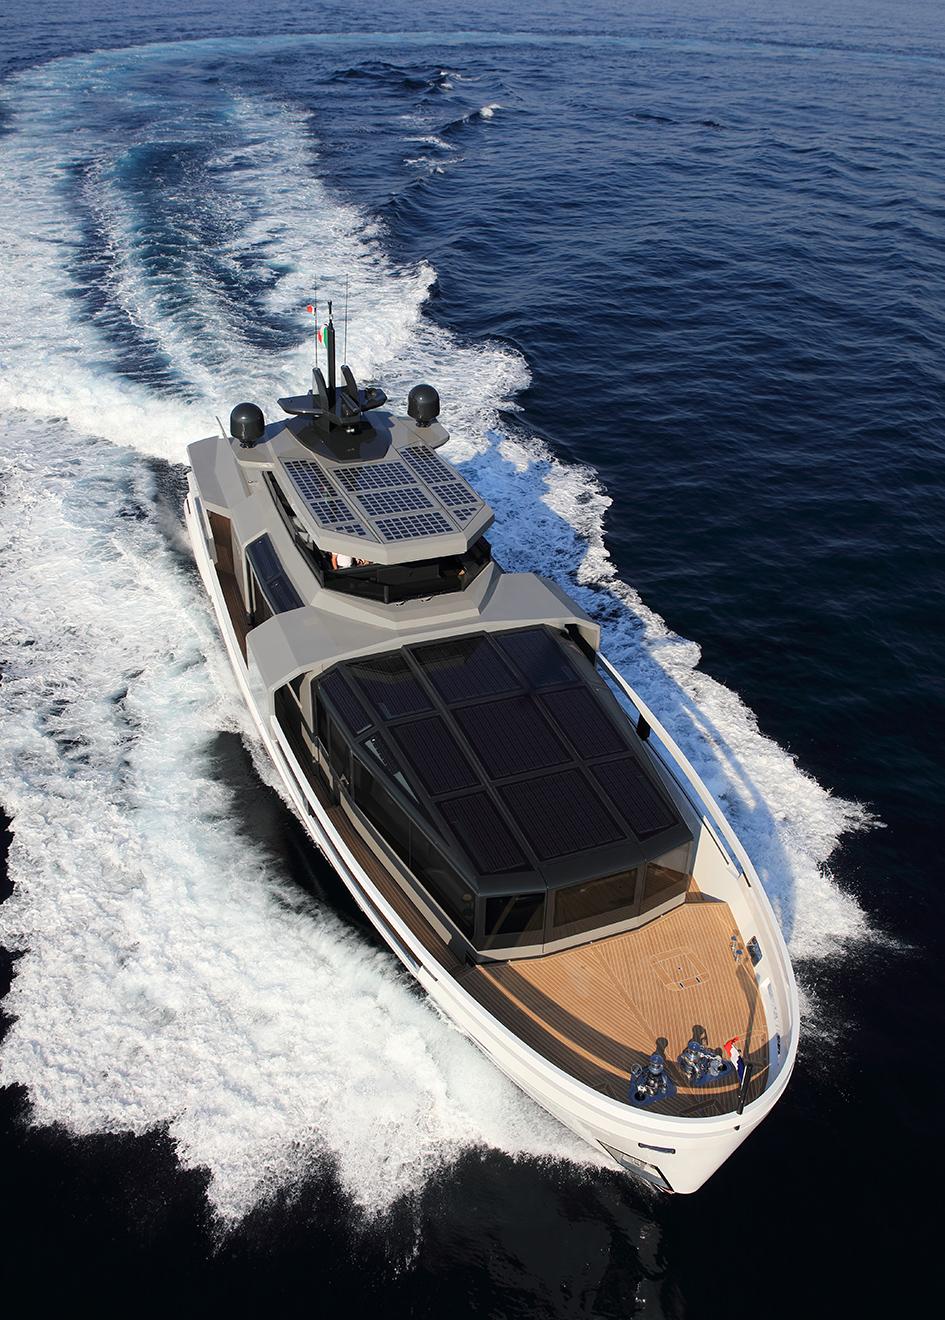 bow-running-shot-of-the-arcadia-100-yacht-aria-s